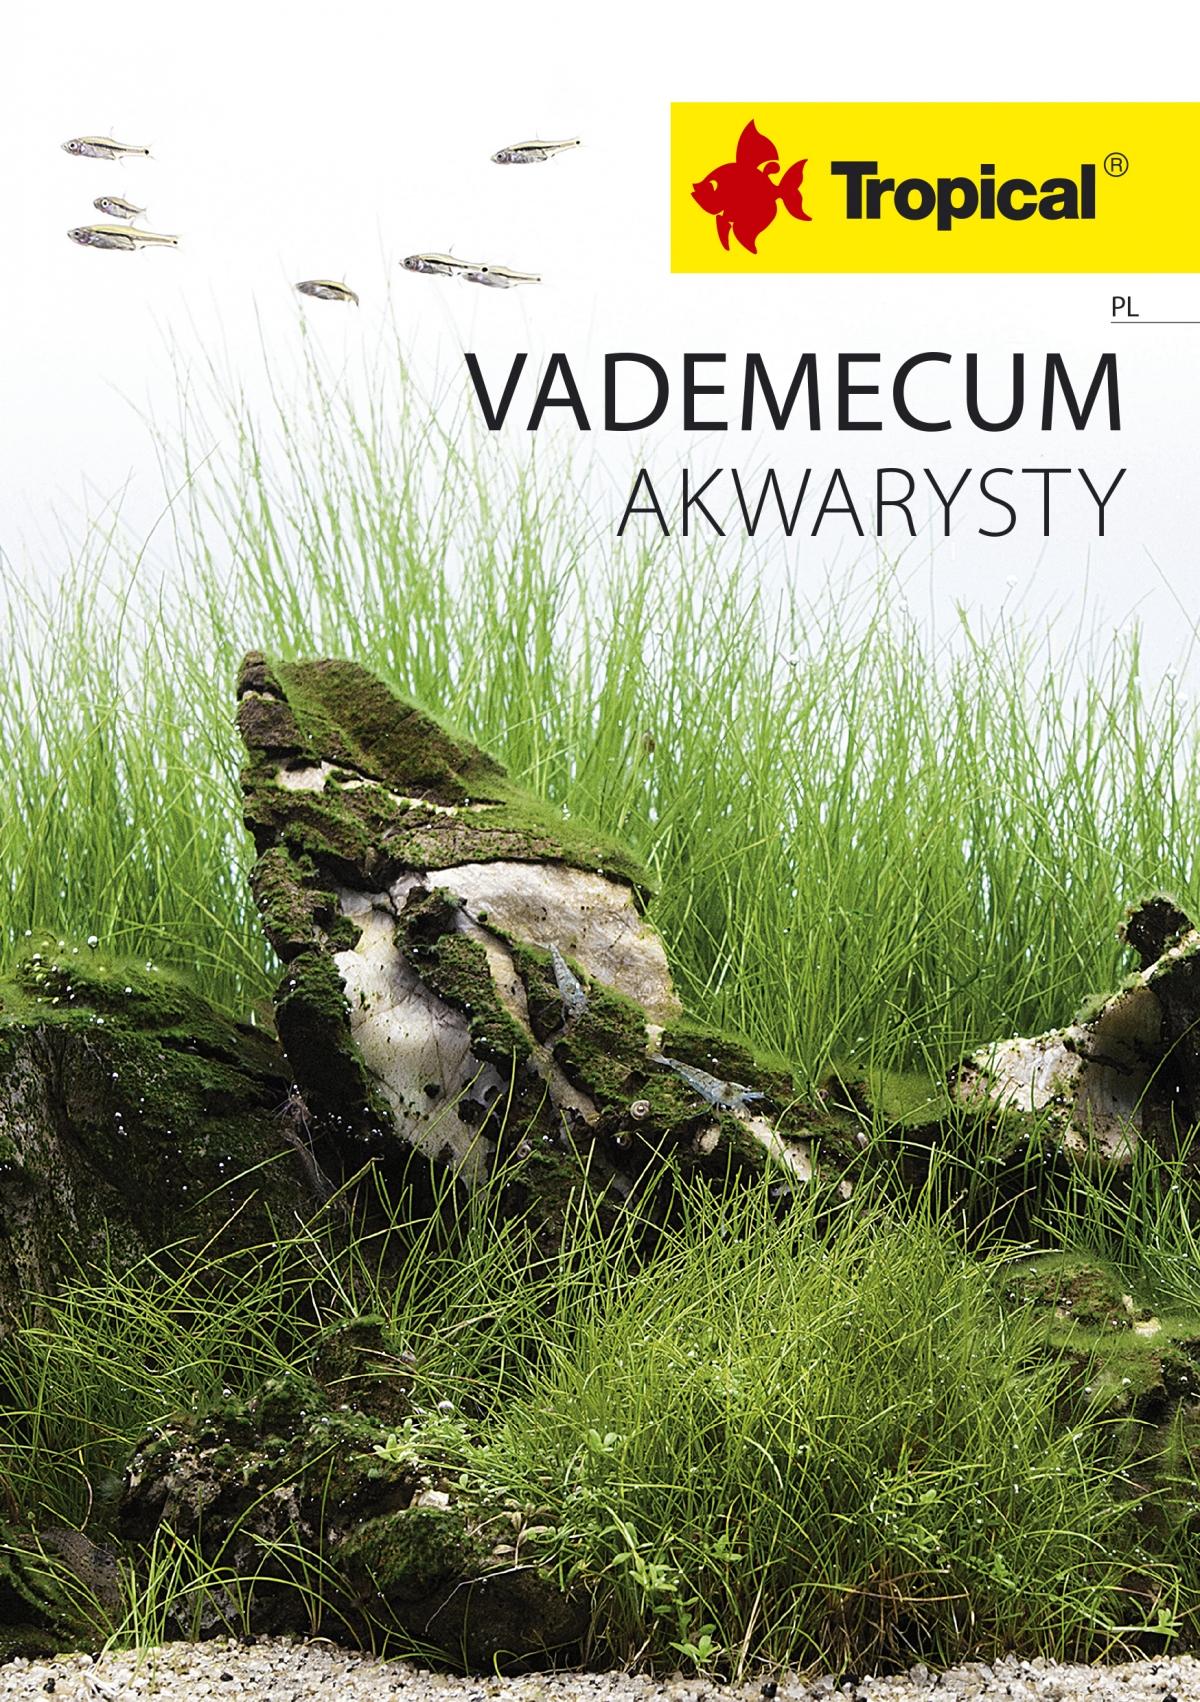 Vademecum Akwarysty PL 2019